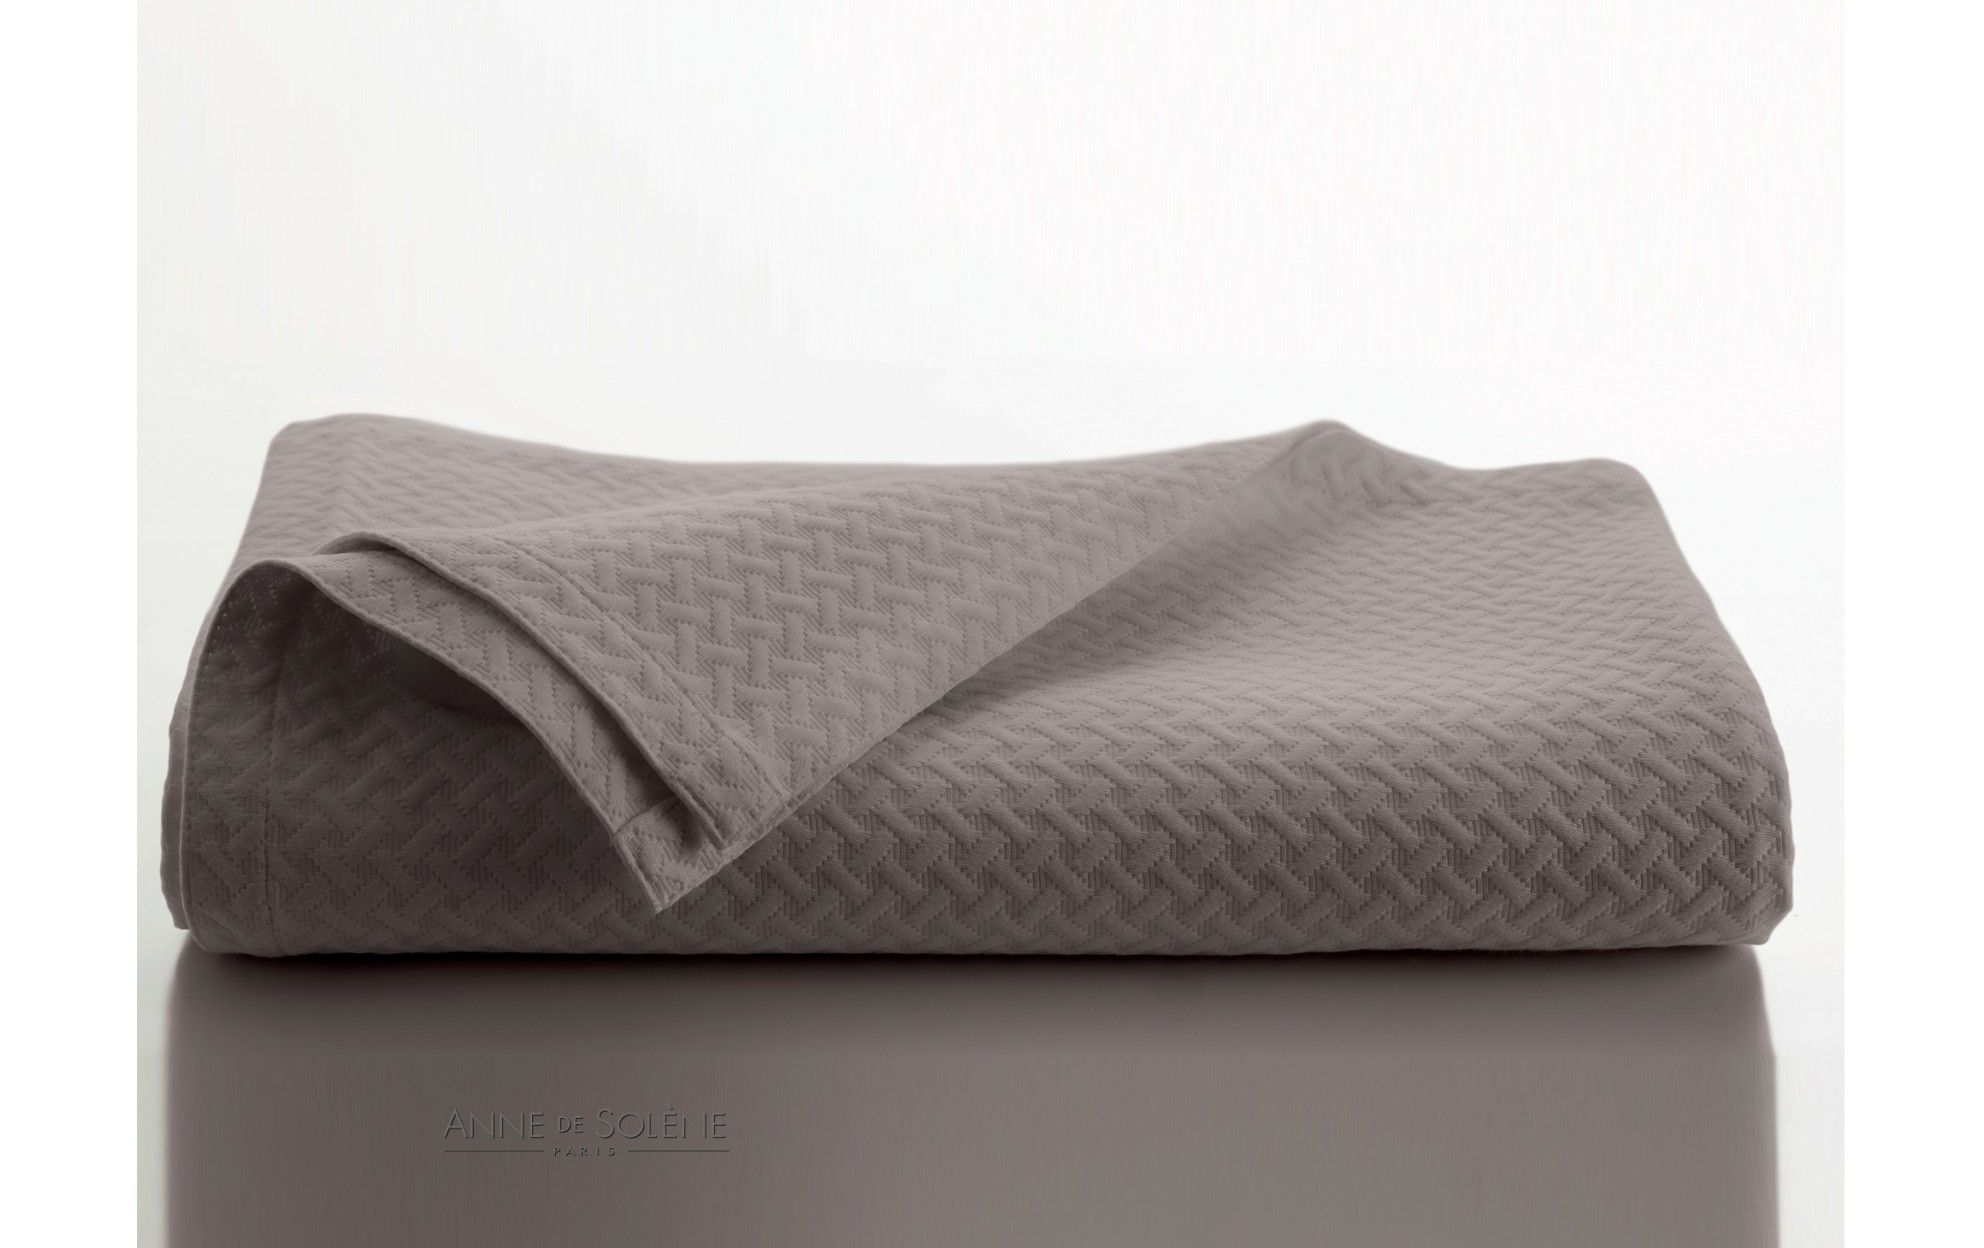 jet de lit safira blanc du beau linge pinterest jet de lit taupe et lits. Black Bedroom Furniture Sets. Home Design Ideas